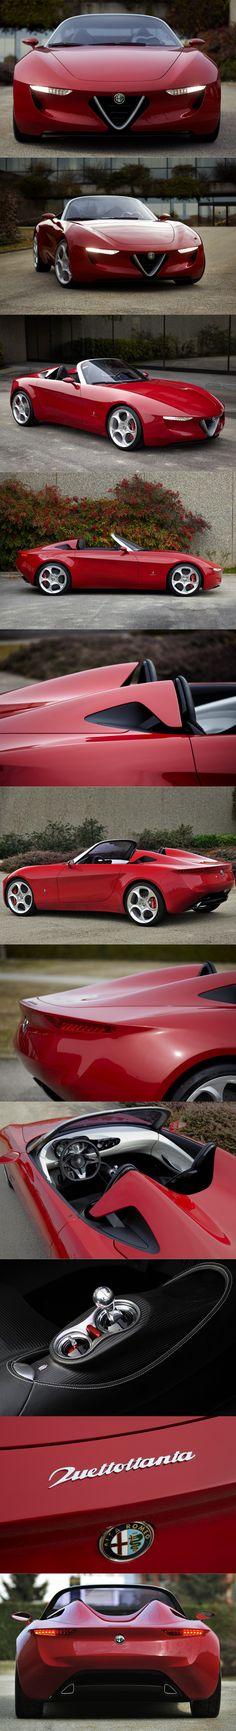 2010 Alfa Romeo 2uettottante / Duetto tribute / Pininfarina 80th anniversay / Alfa Romeo centenary / Italy Belgium / red / concept / Lowie Vermeersch / 17-307